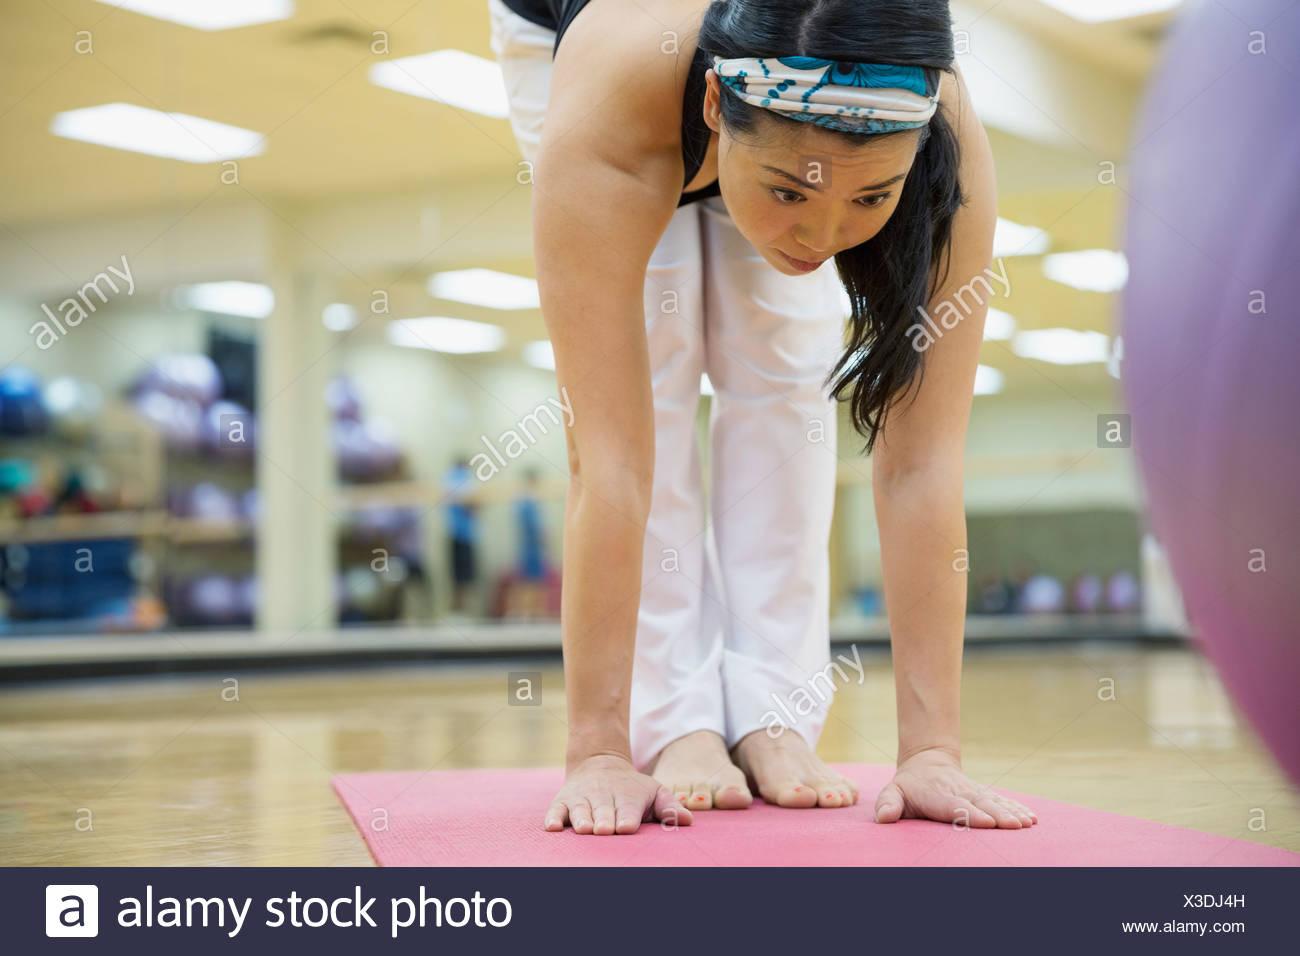 Frau praktizieren Yoga im Fitness-Studio Stockbild